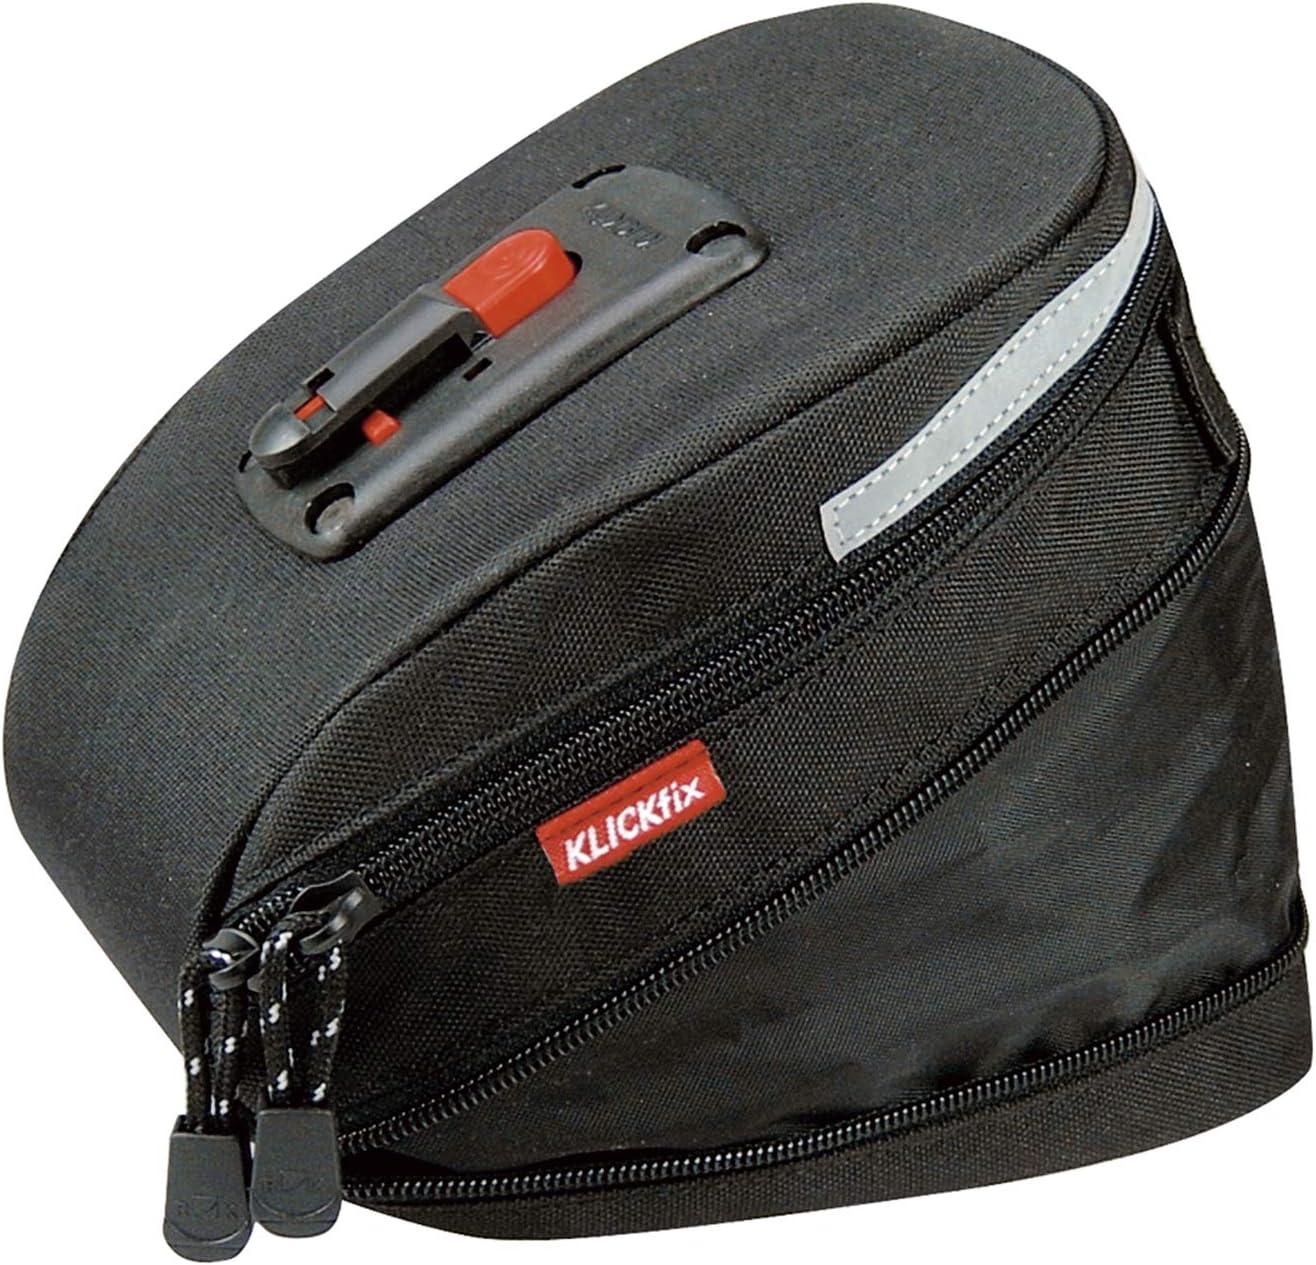 KlickFix Micro 200 Expandable Satteltasche